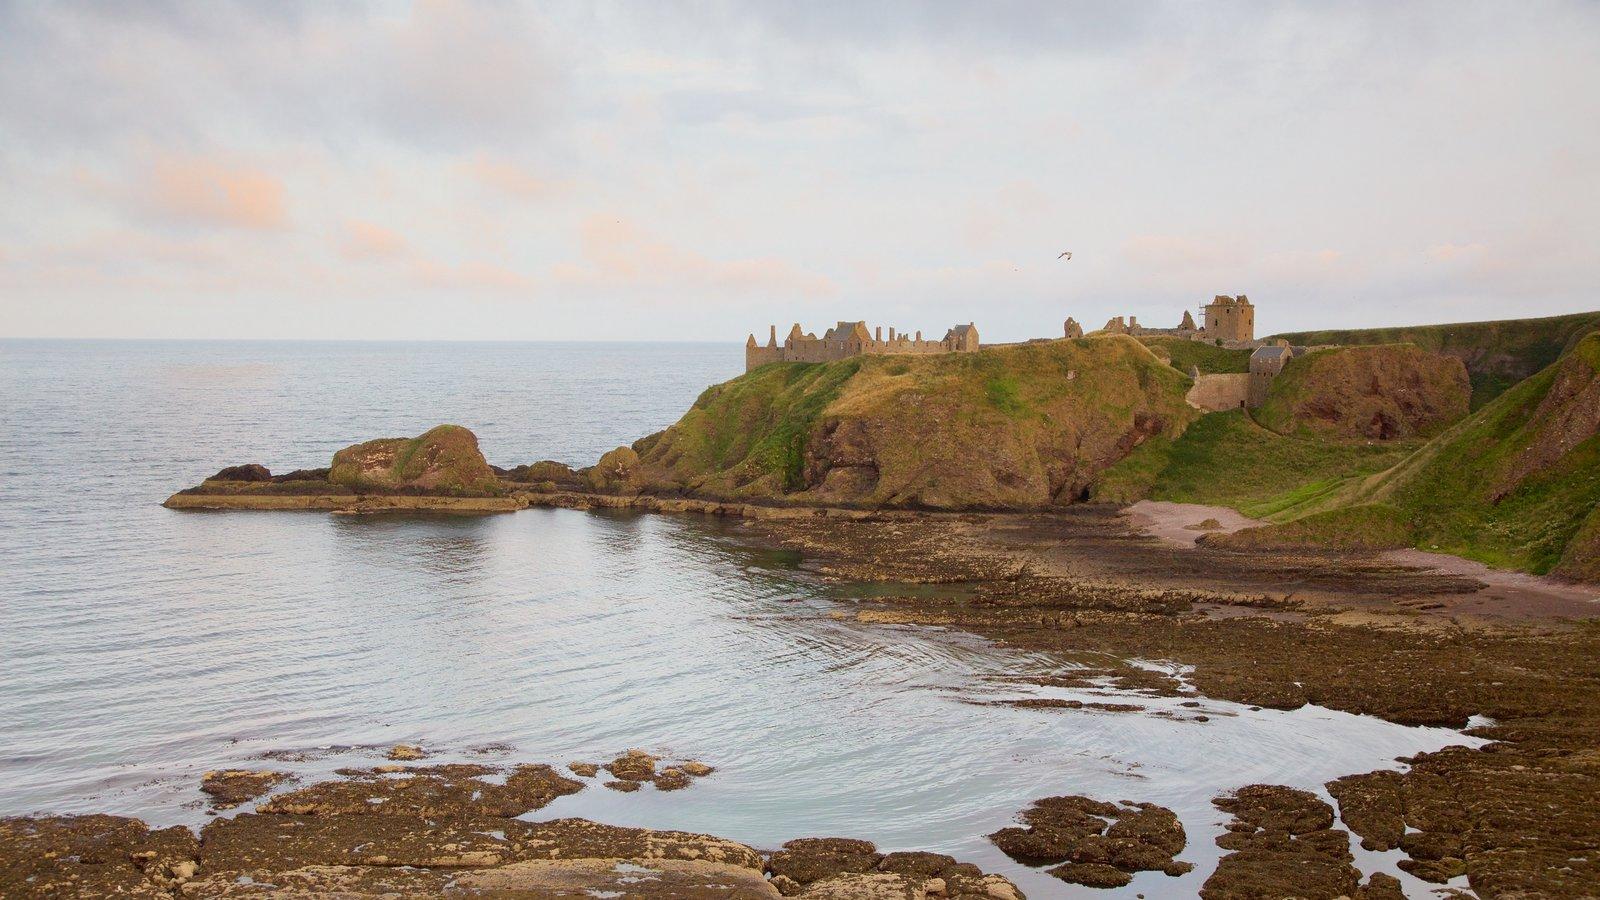 Dunnottar Castle featuring rocky coastline